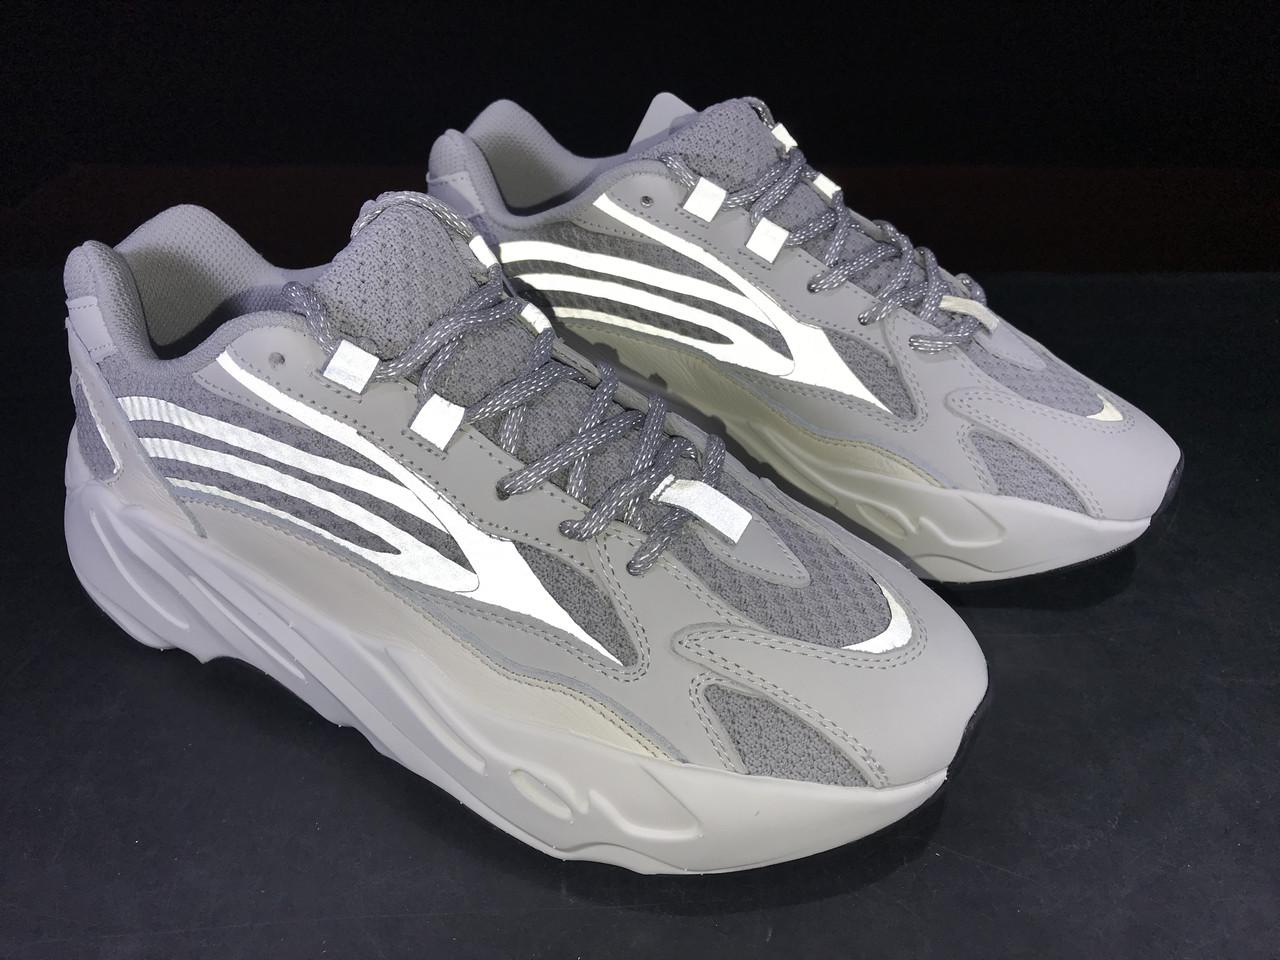 fa4caa8f Кроссовки Adidas Yeezy Boost 700 V2 Static, цена 1 649 грн., купить ...